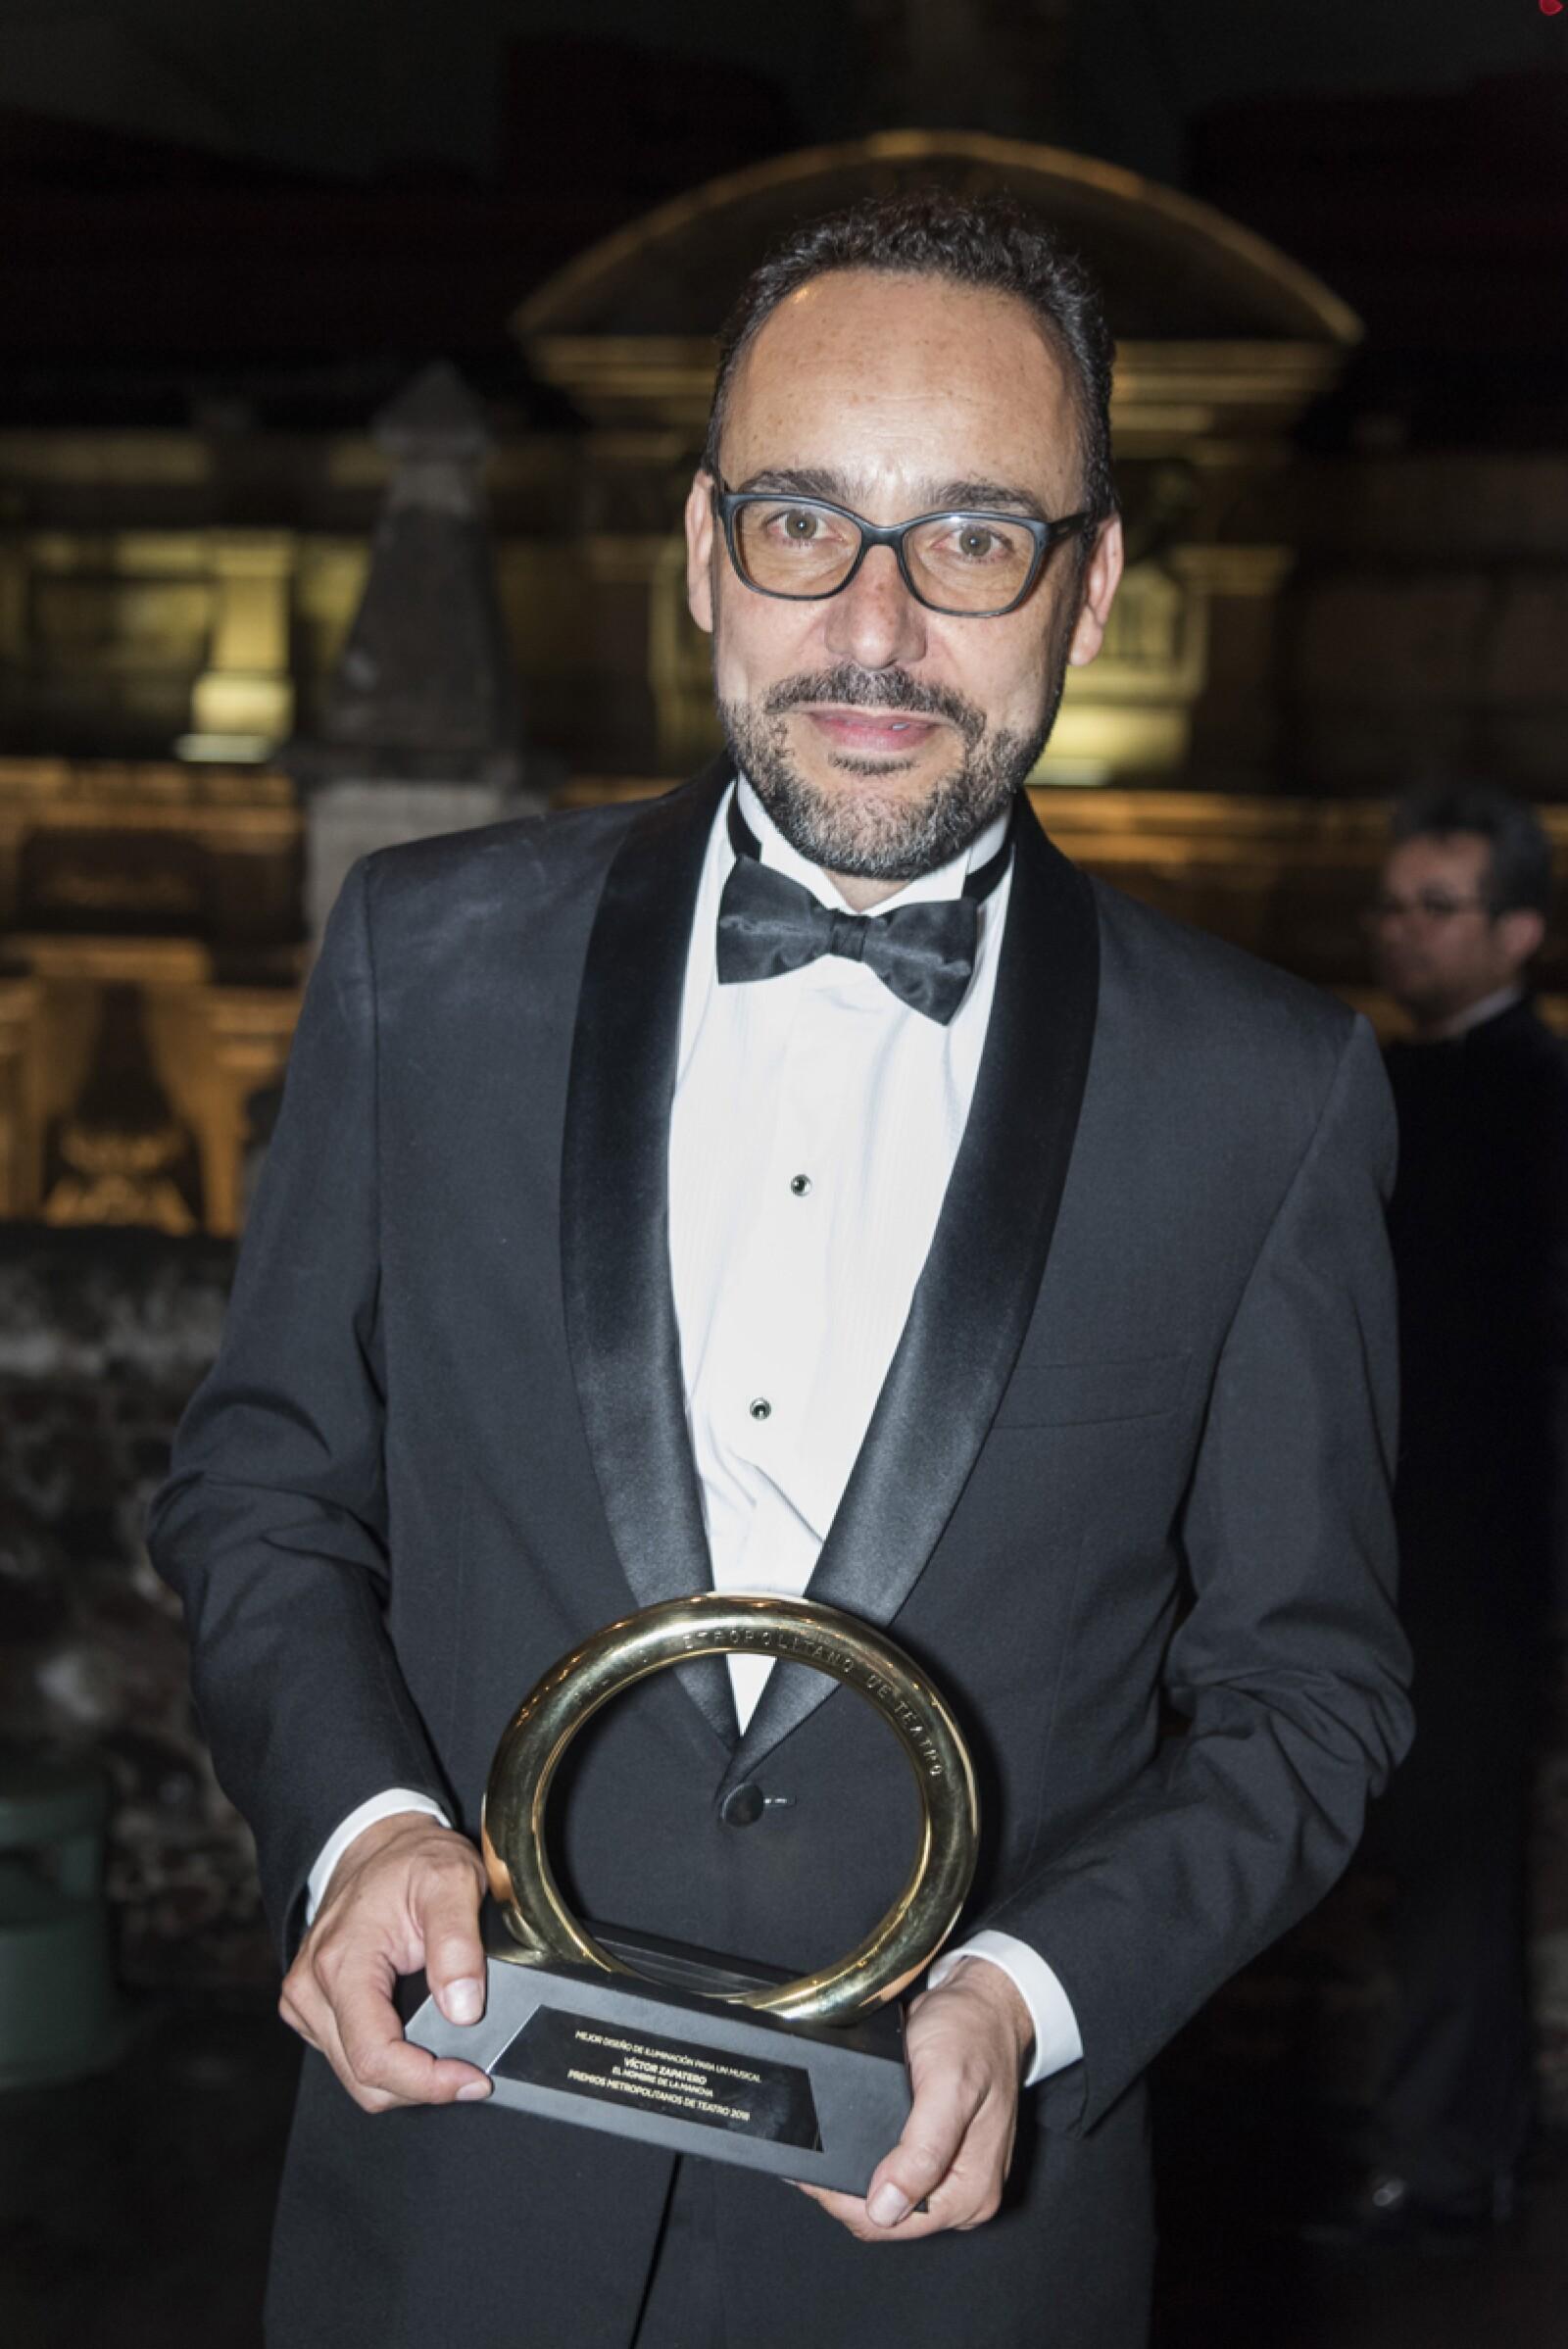 Qui, premios metropolitanos,28 agosto 2018, Nancy López,026.jpg